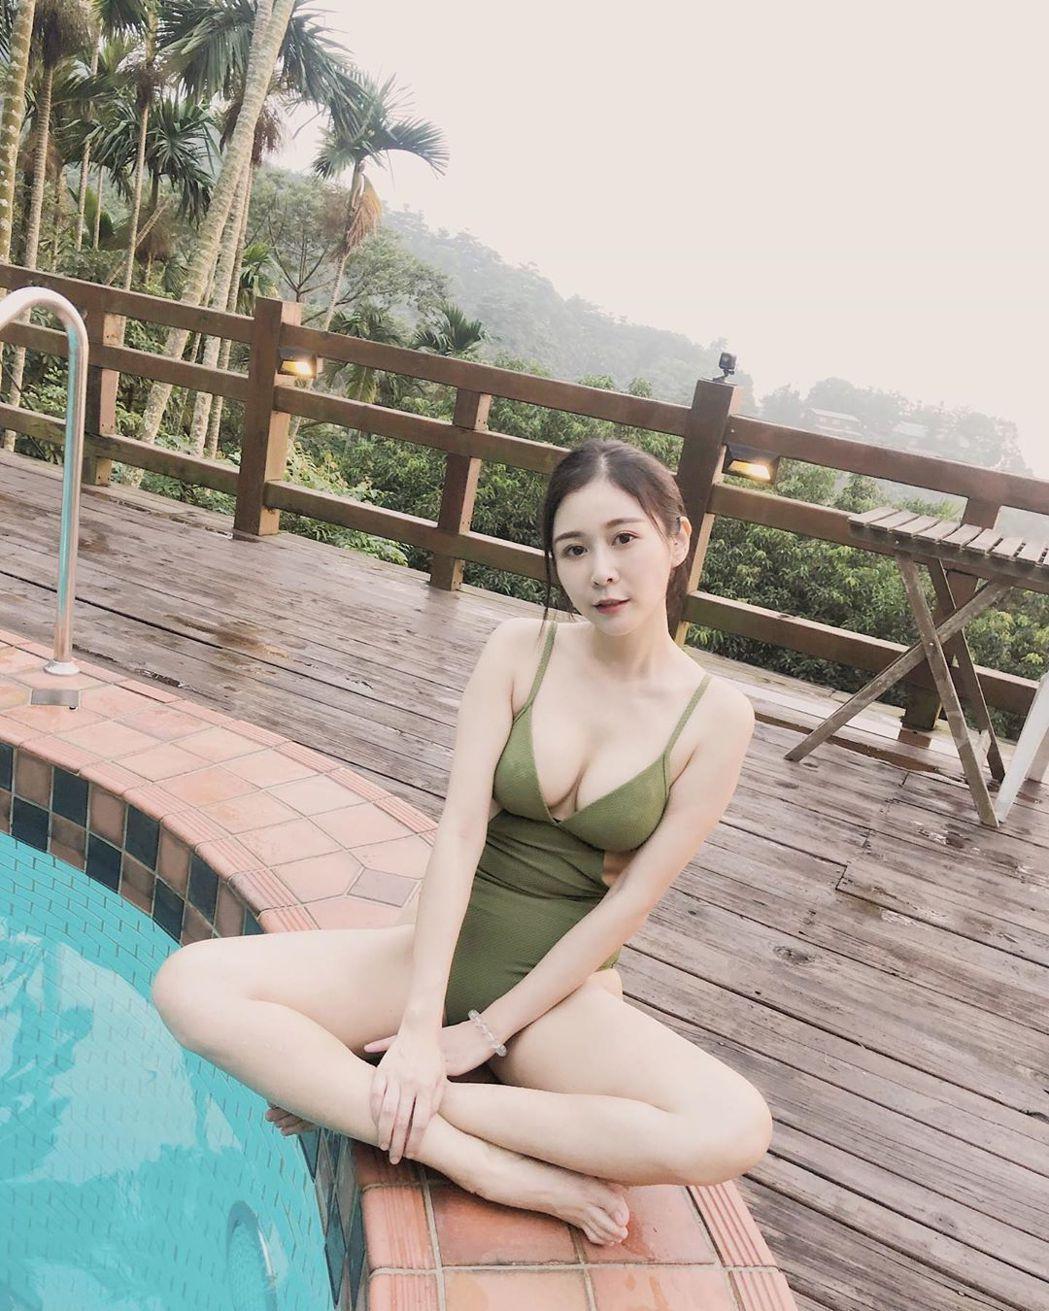 Albee分享泳裝辣照。 圖/擷自Albee IG